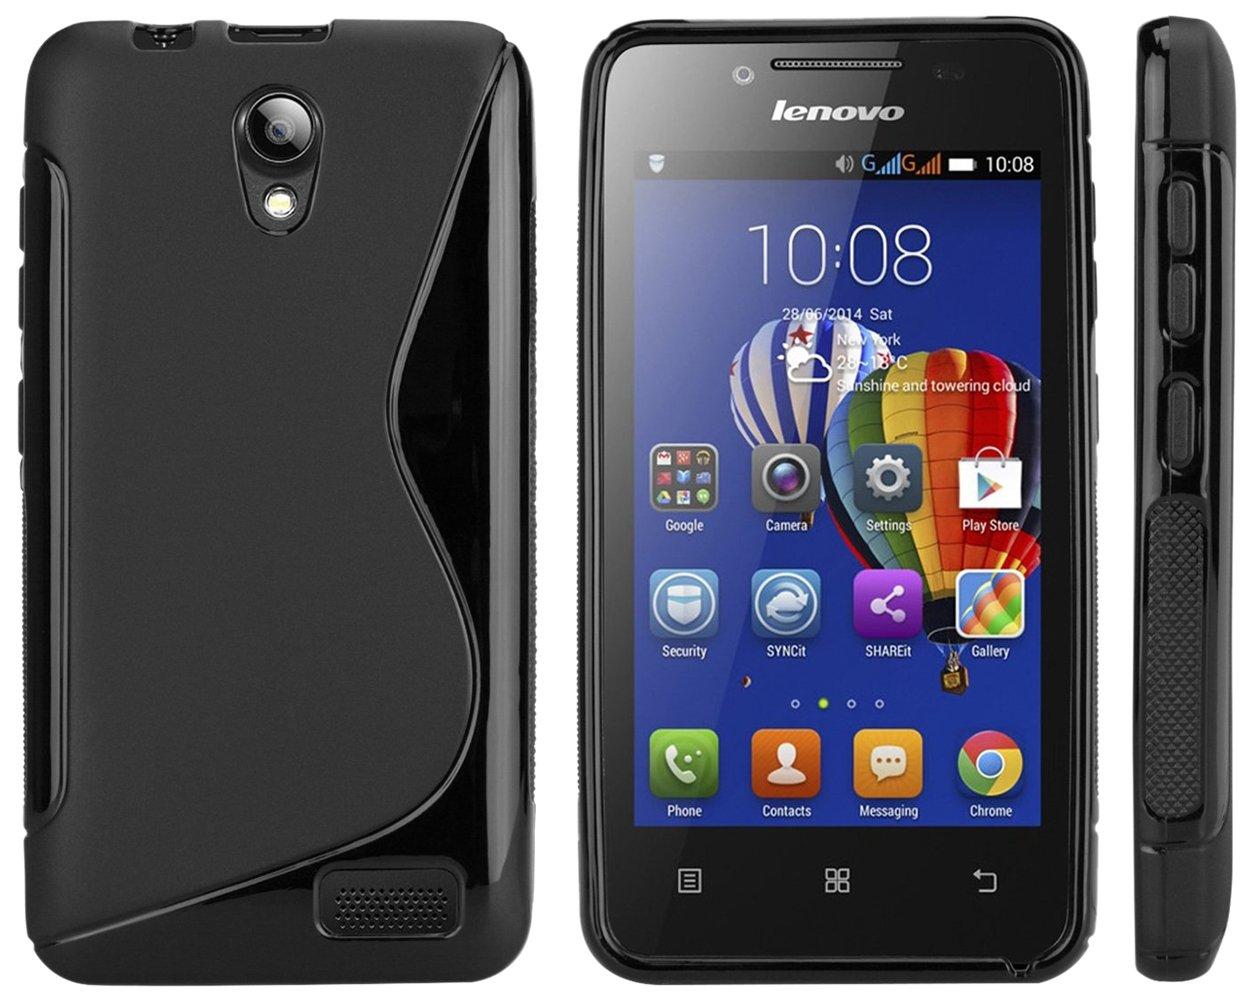 sale retailer 2f2cb a3a32 S Case Rubber Back Cover For Lenovo A319 (Black)